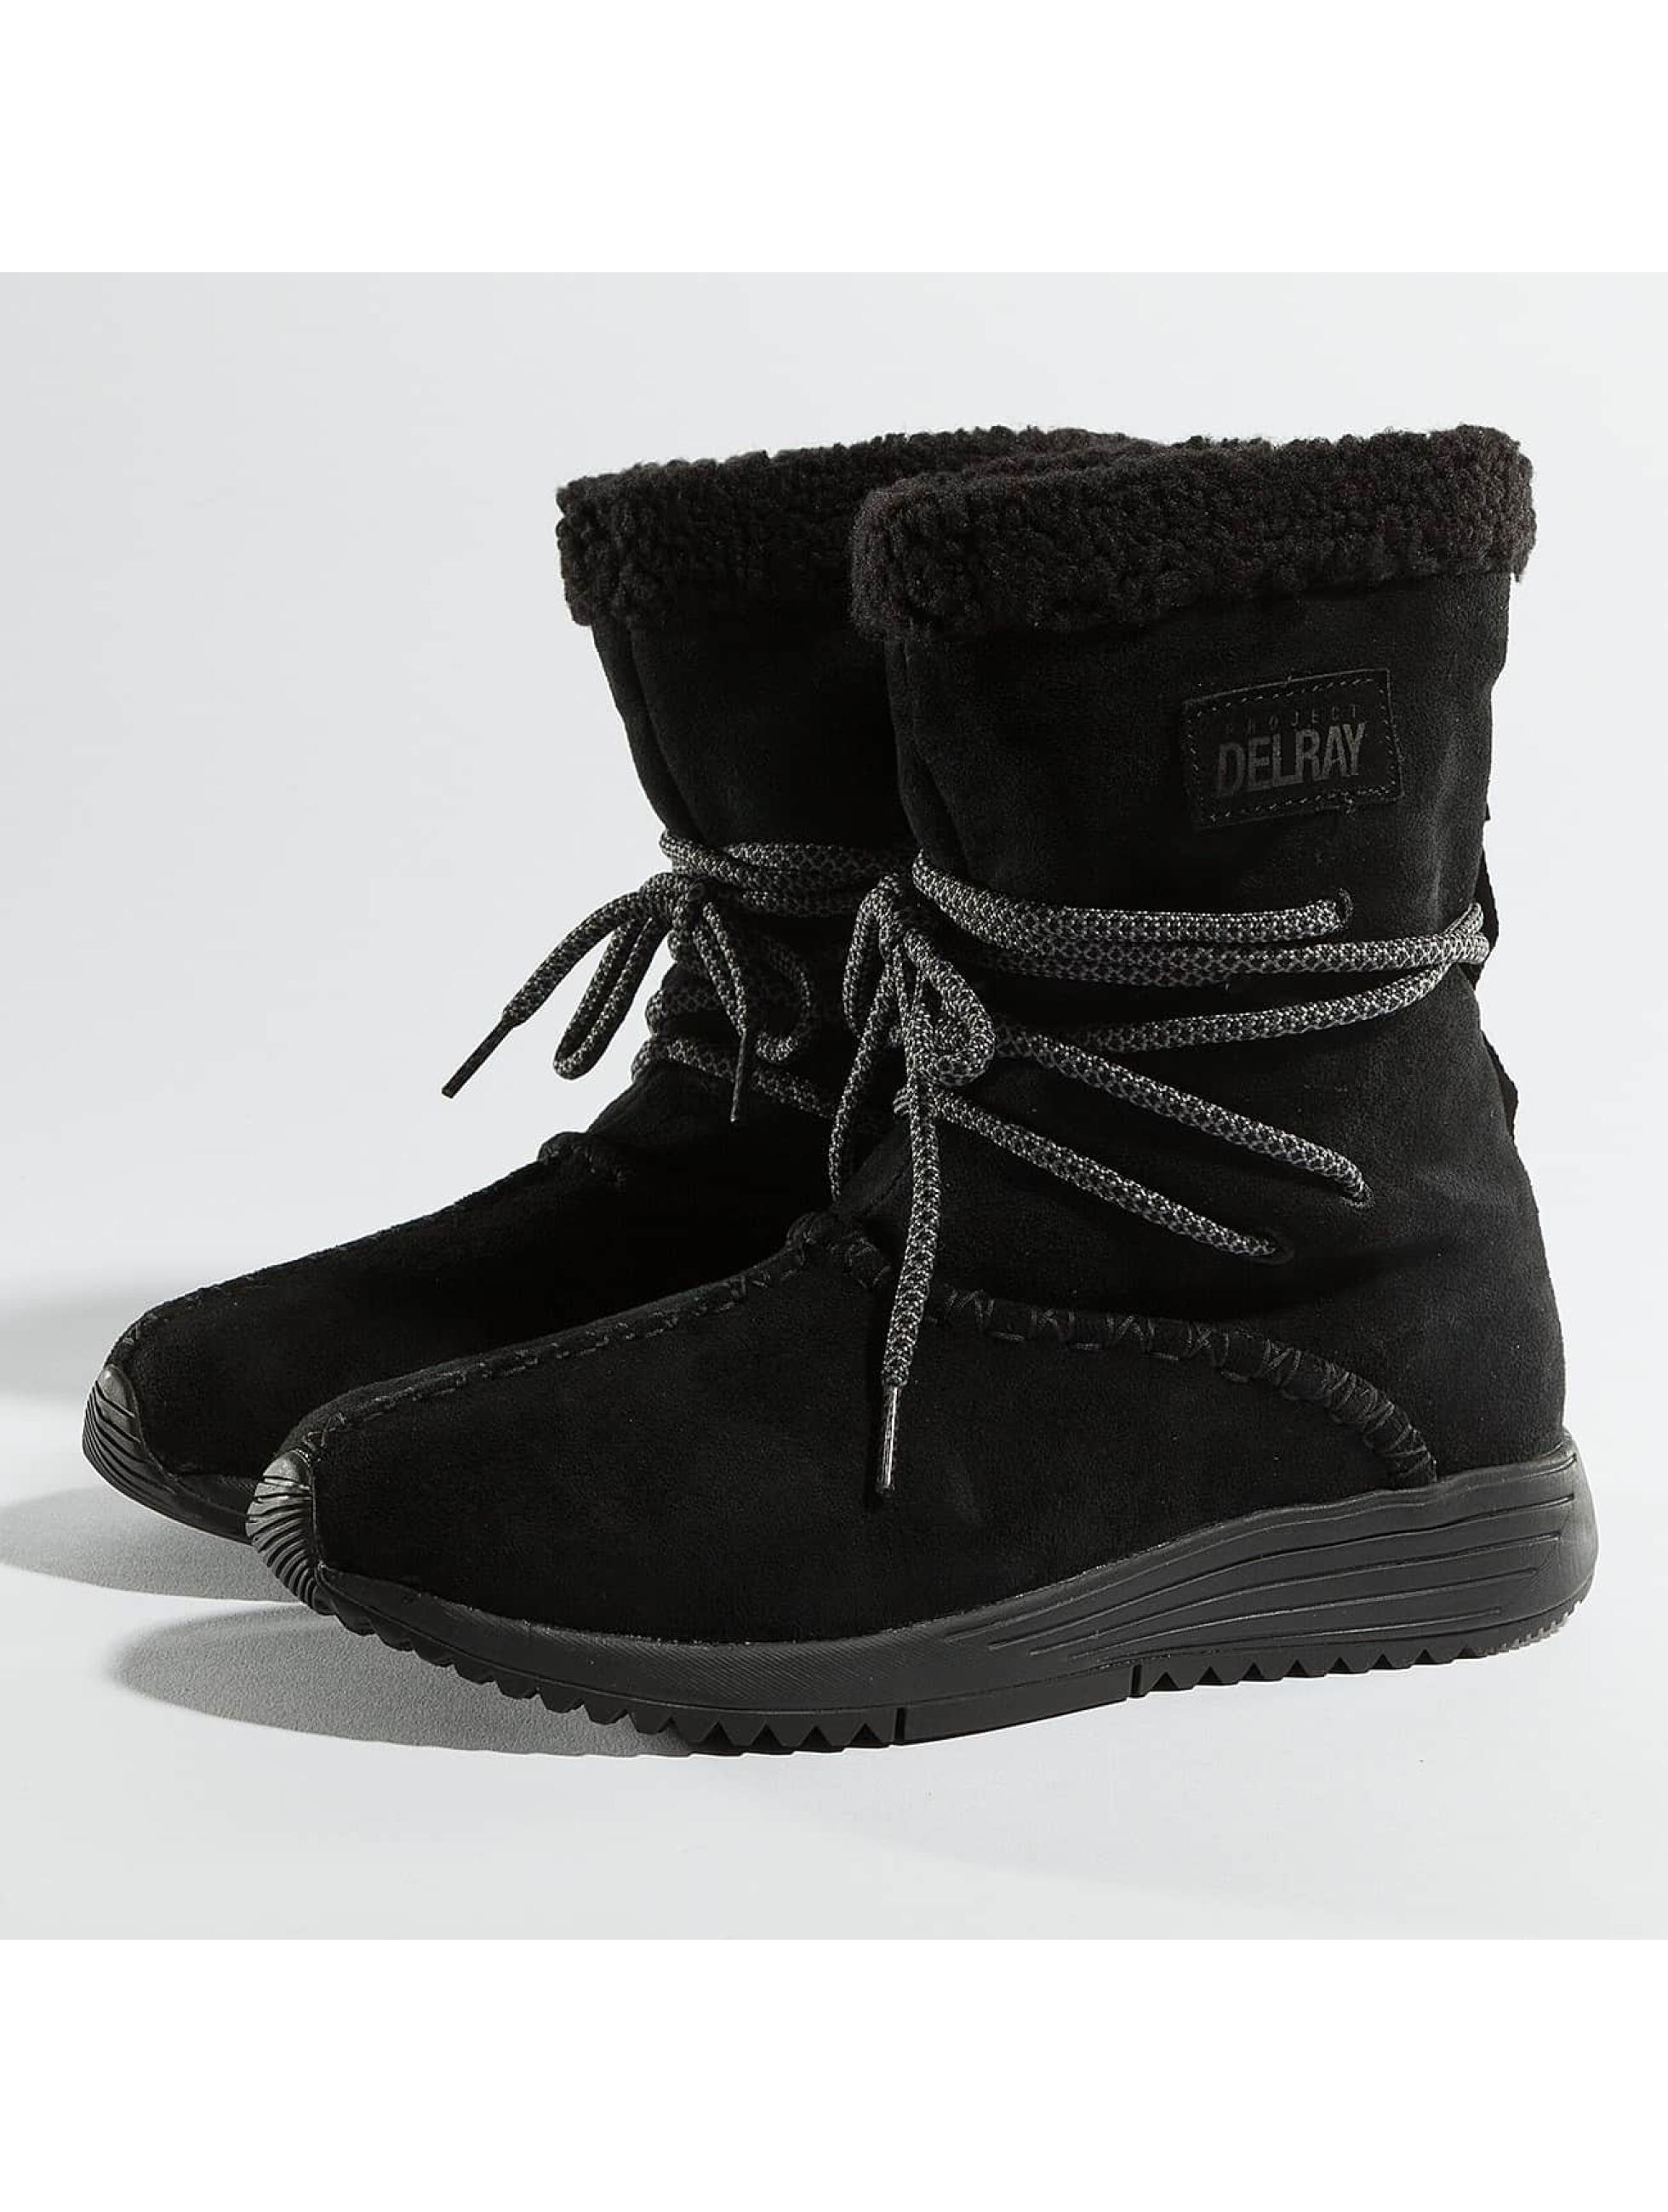 Project Delray Frauen Boots Wavy Lux High in schwarz